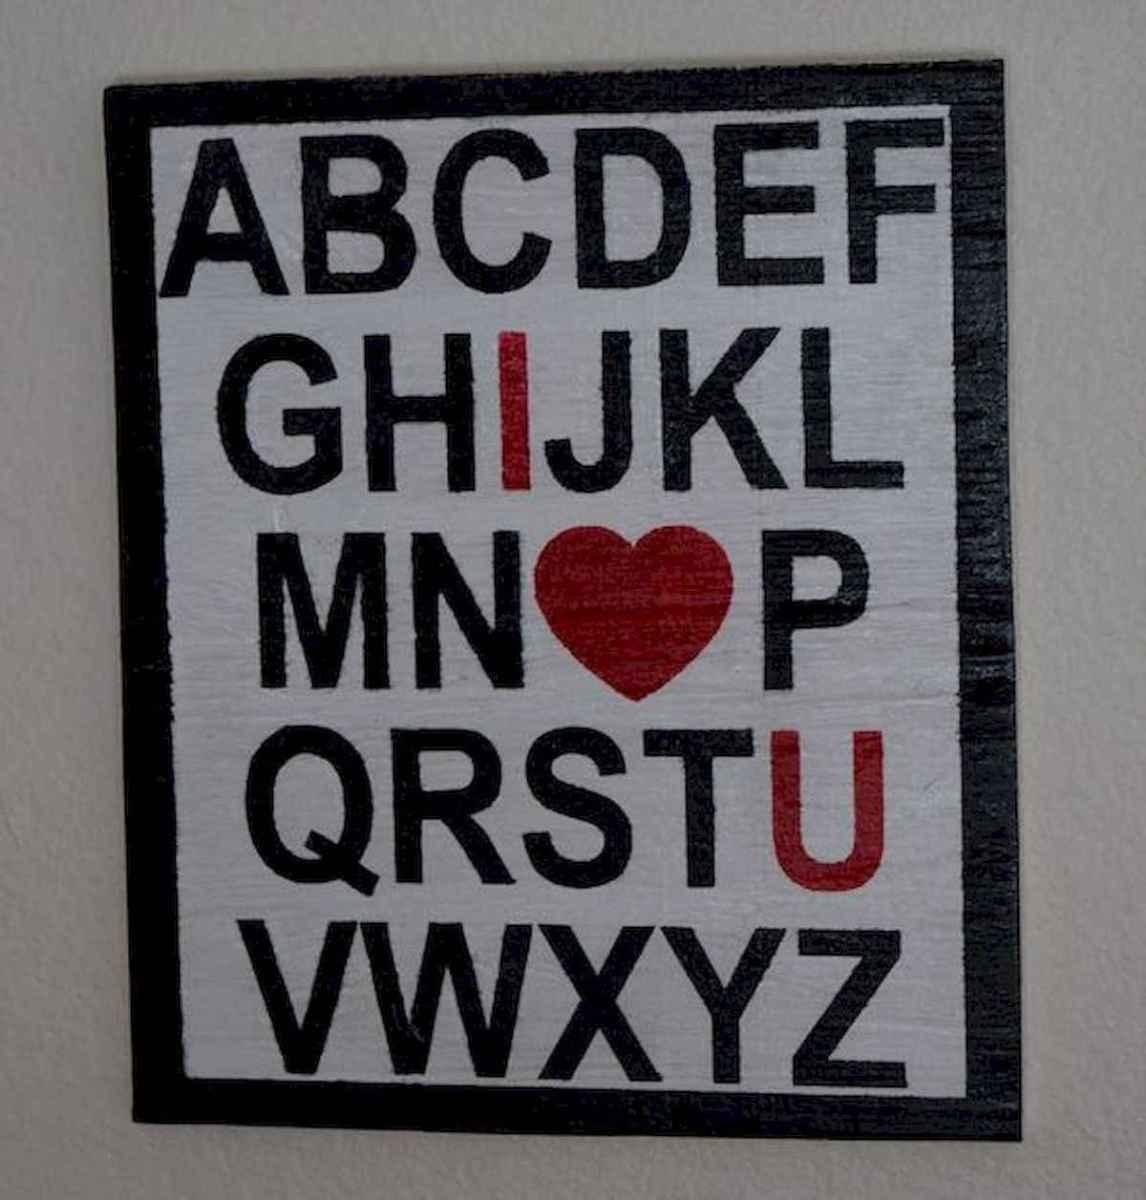 75 lovely valentines day crafts design ideas (7)